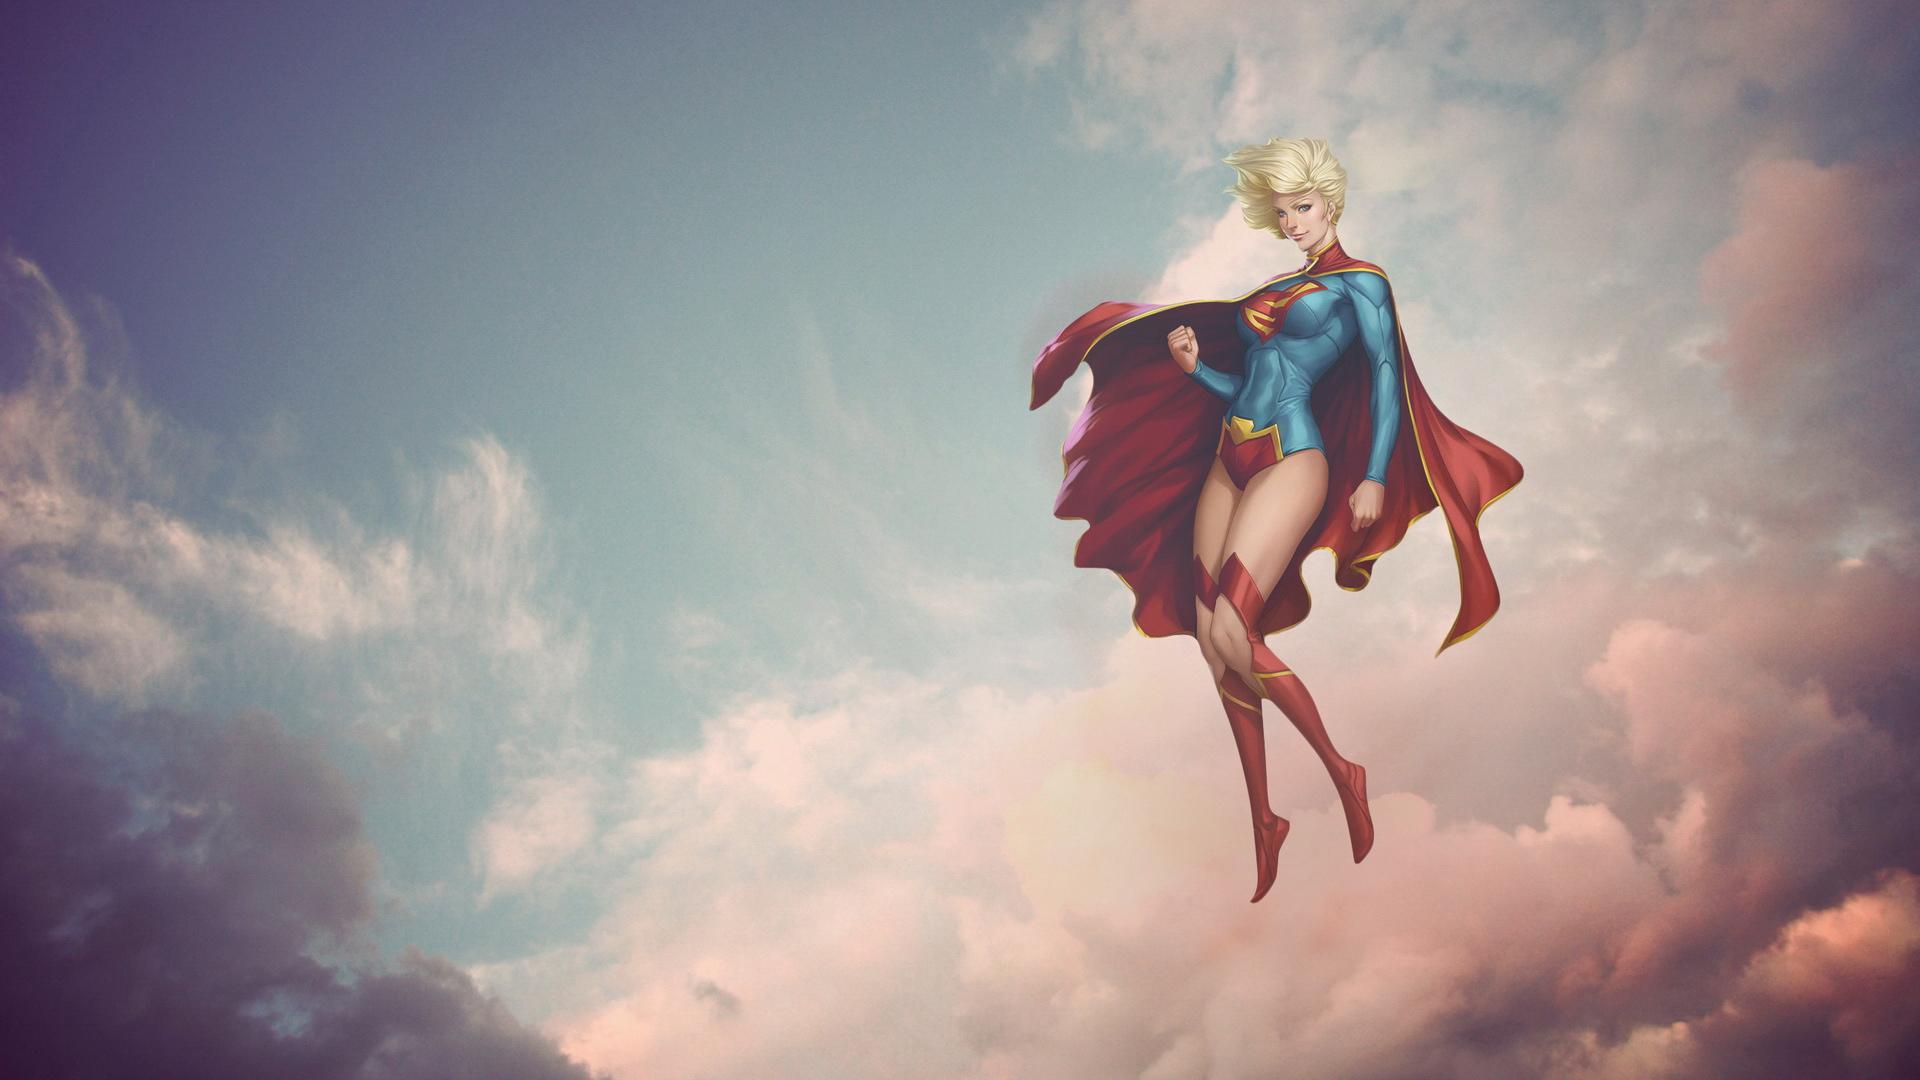 Simple Wallpaper Logo Supergirl - supergirl-fantasy-art-jc  2018_341084.jpg